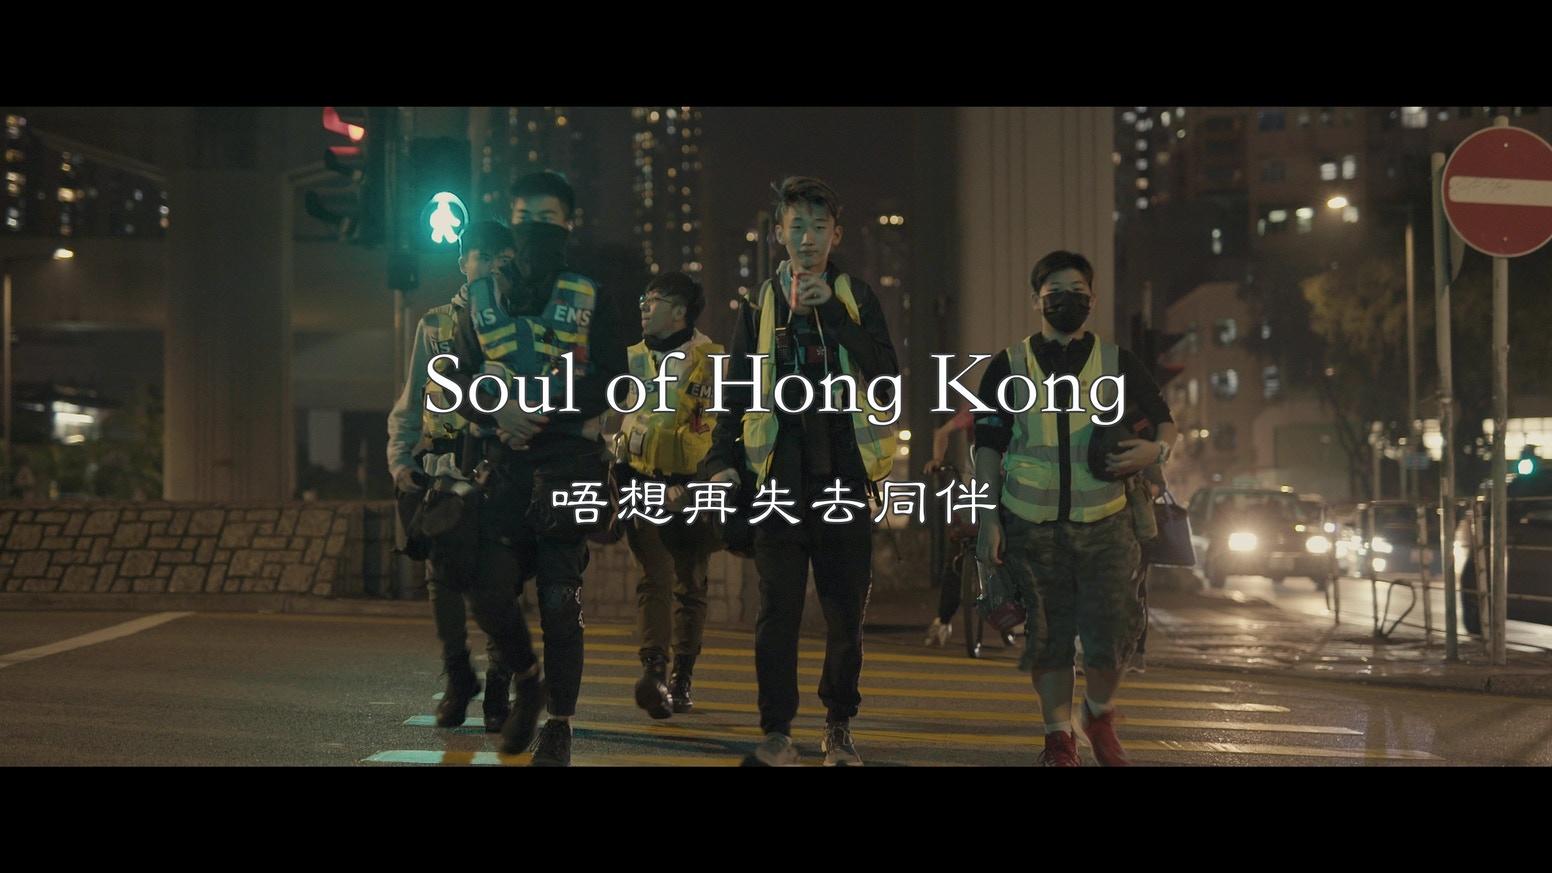 【Soul of Hong Kong ~唔想再失去同伴~香港民主化運動紀錄片眾籌 本辦將協助分發學生抗疫口罩及濾棉】